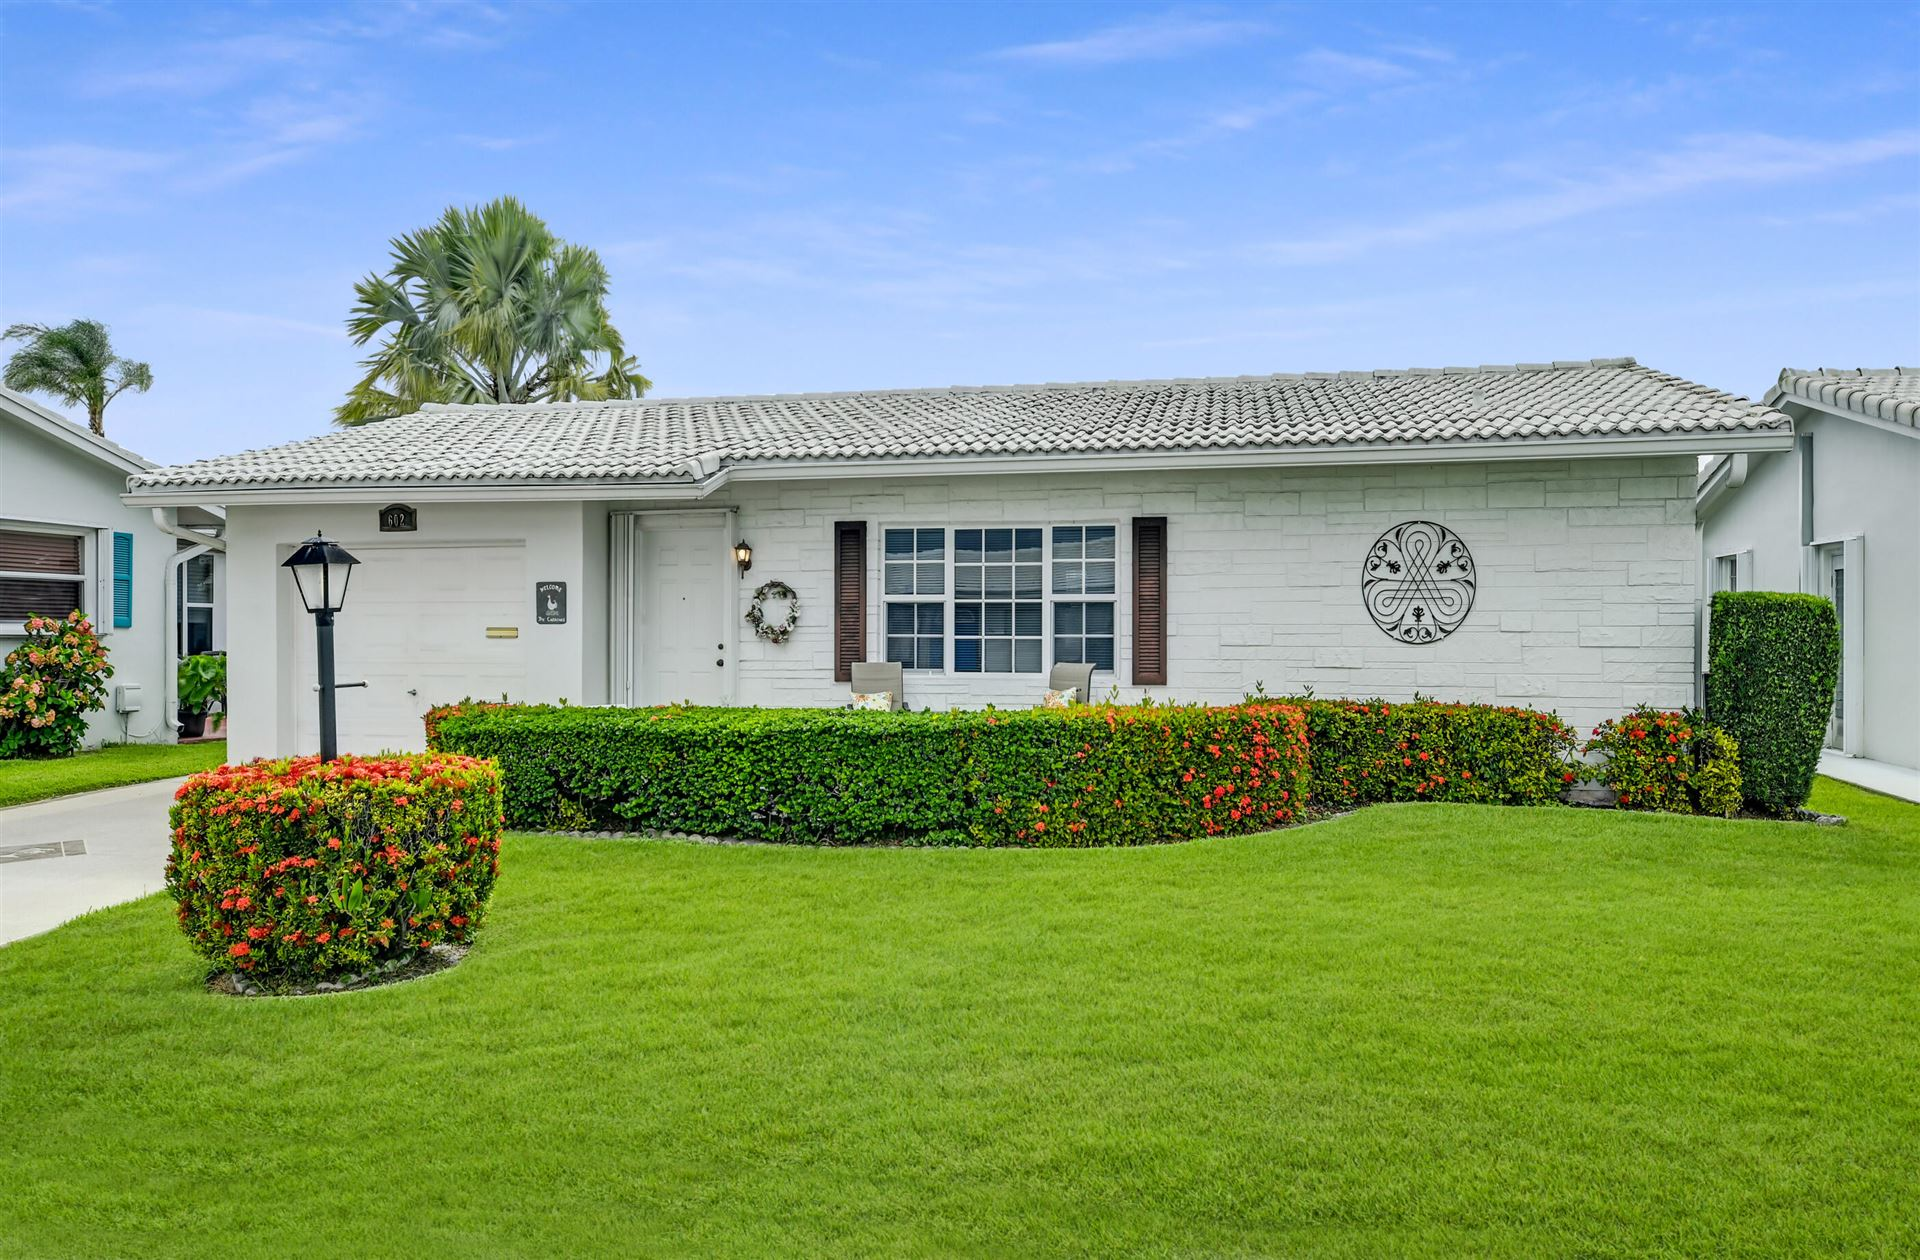 602 SW Golf Drive, Boynton Beach, FL 33426 - MLS#: RX-10719114